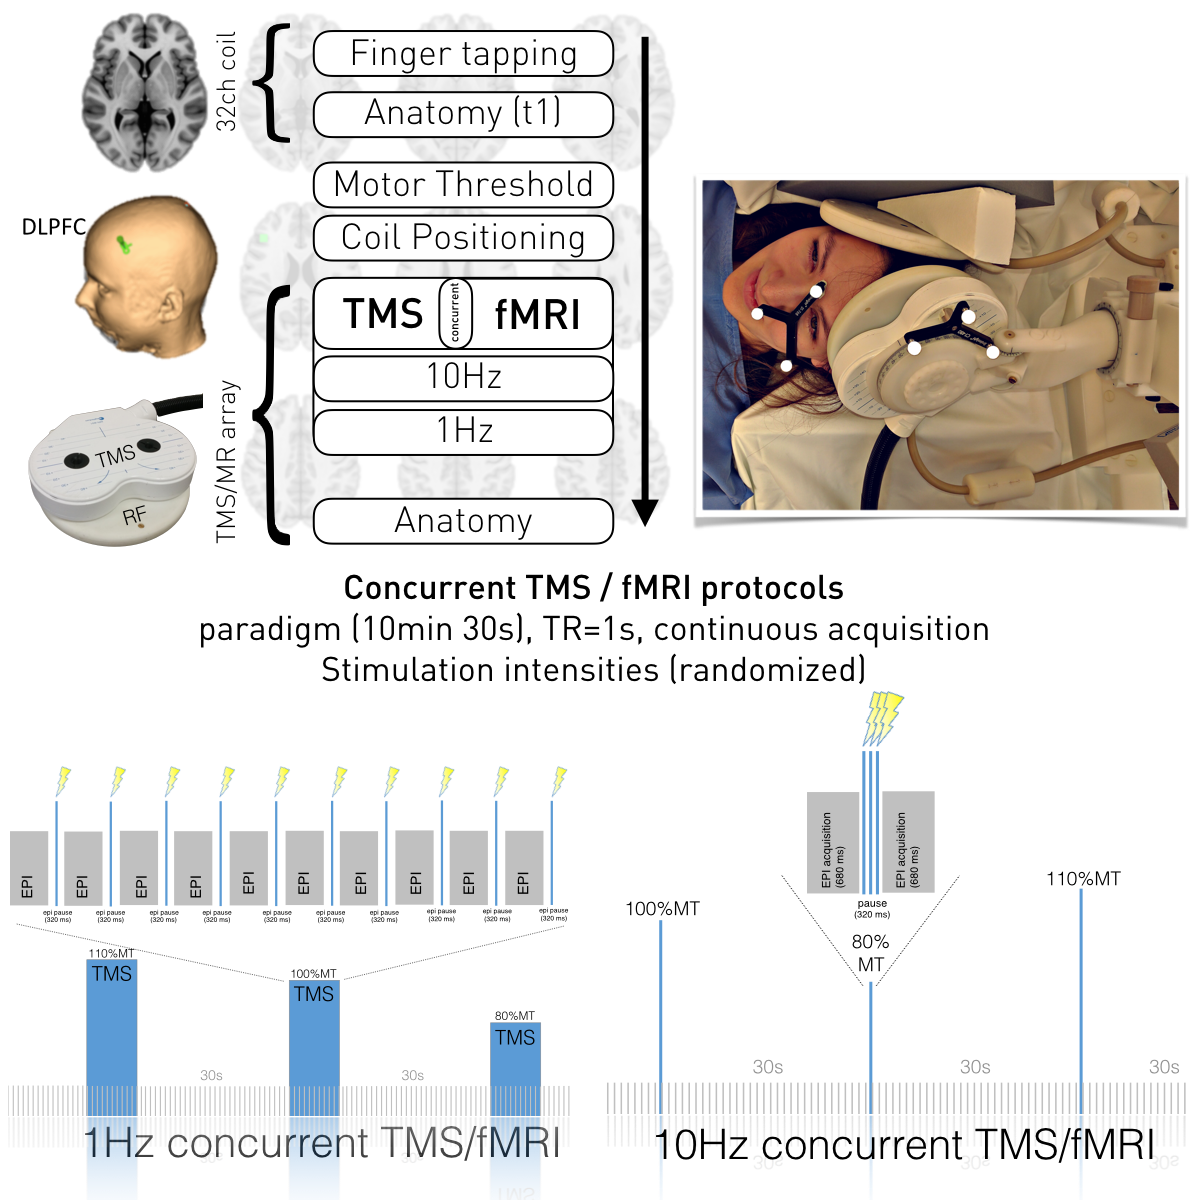 Interleaved TMS/fMRI